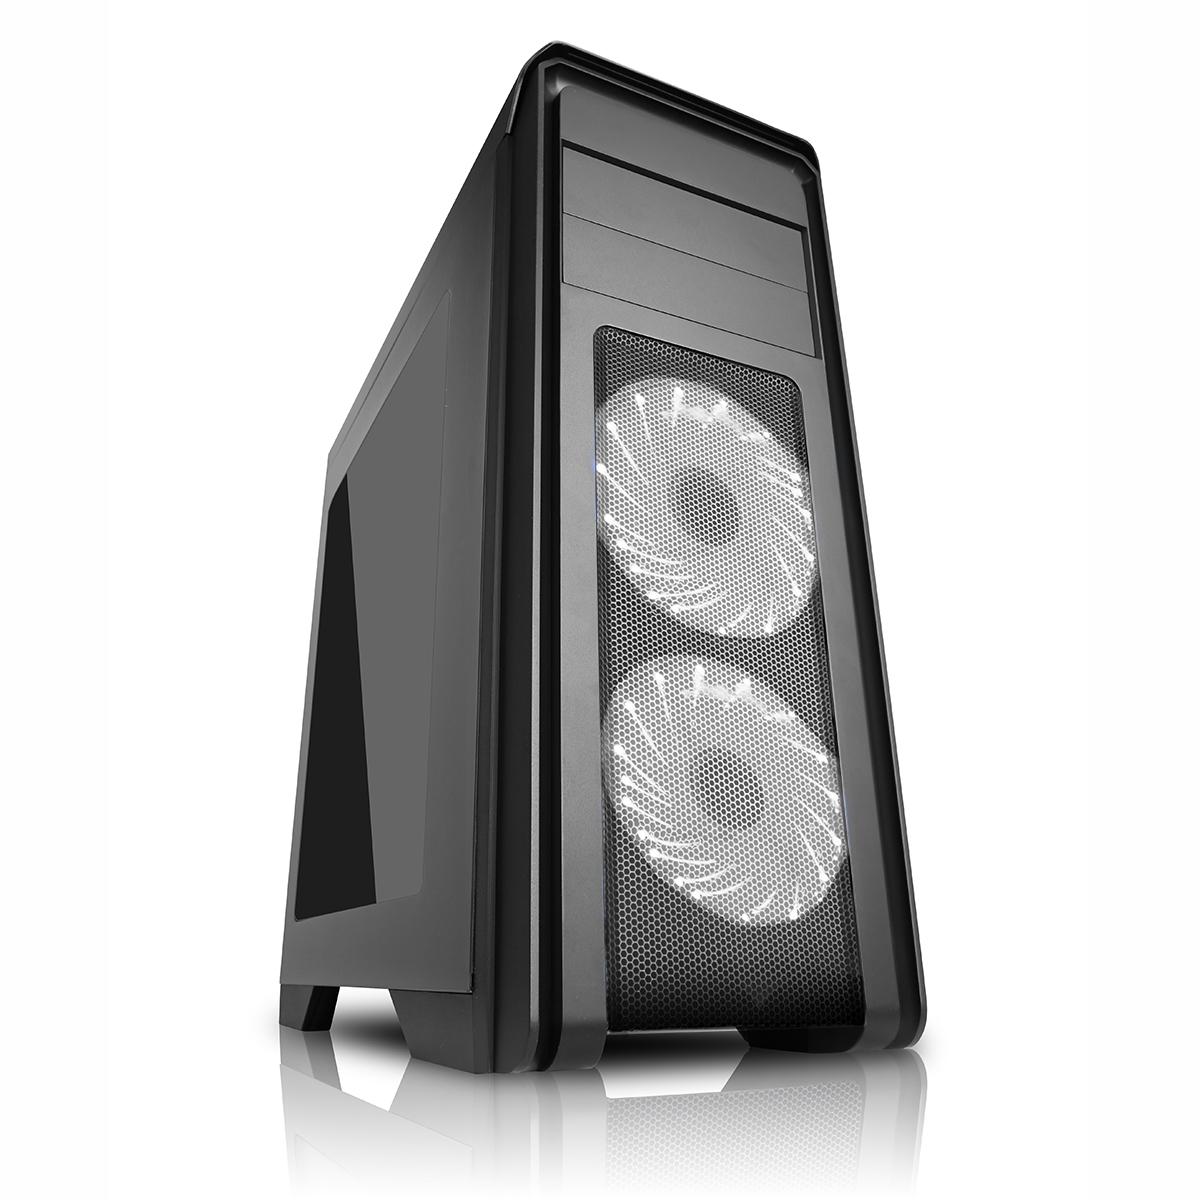 Game Max Falcon Pc Gaming Case Rgb Windowed Black Pc Case